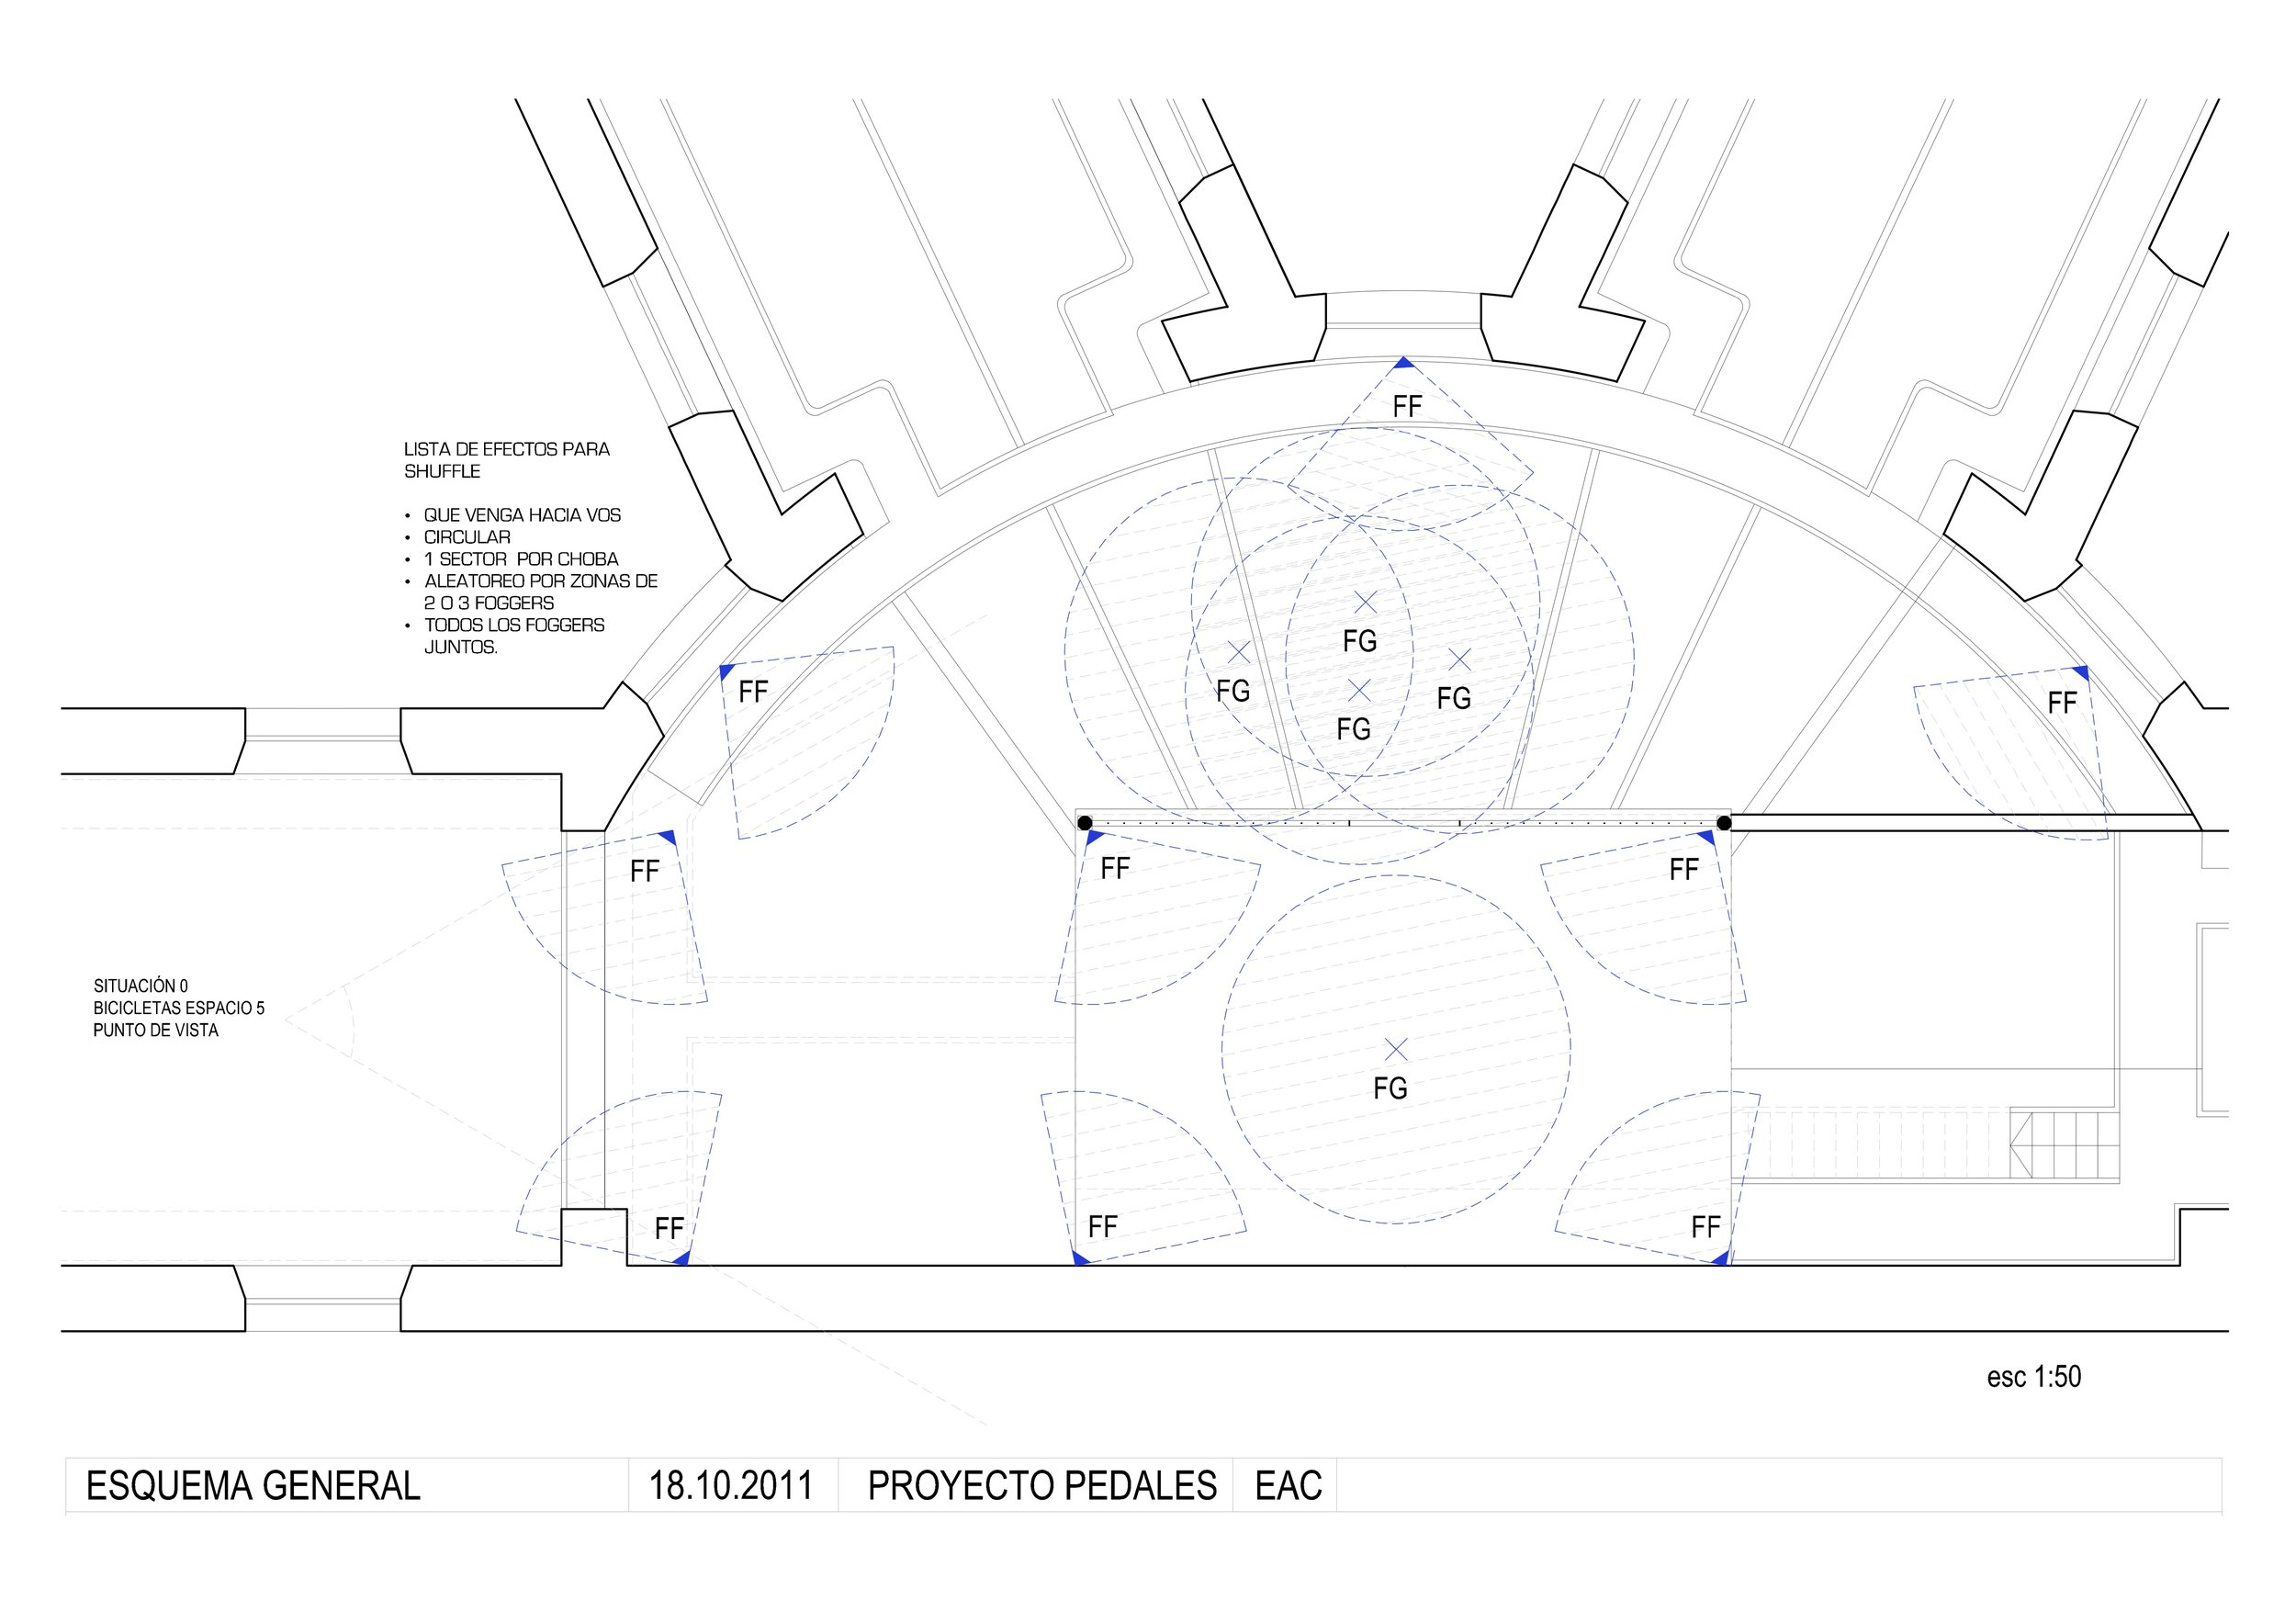 esquema general pedales-hoja 2.jpg